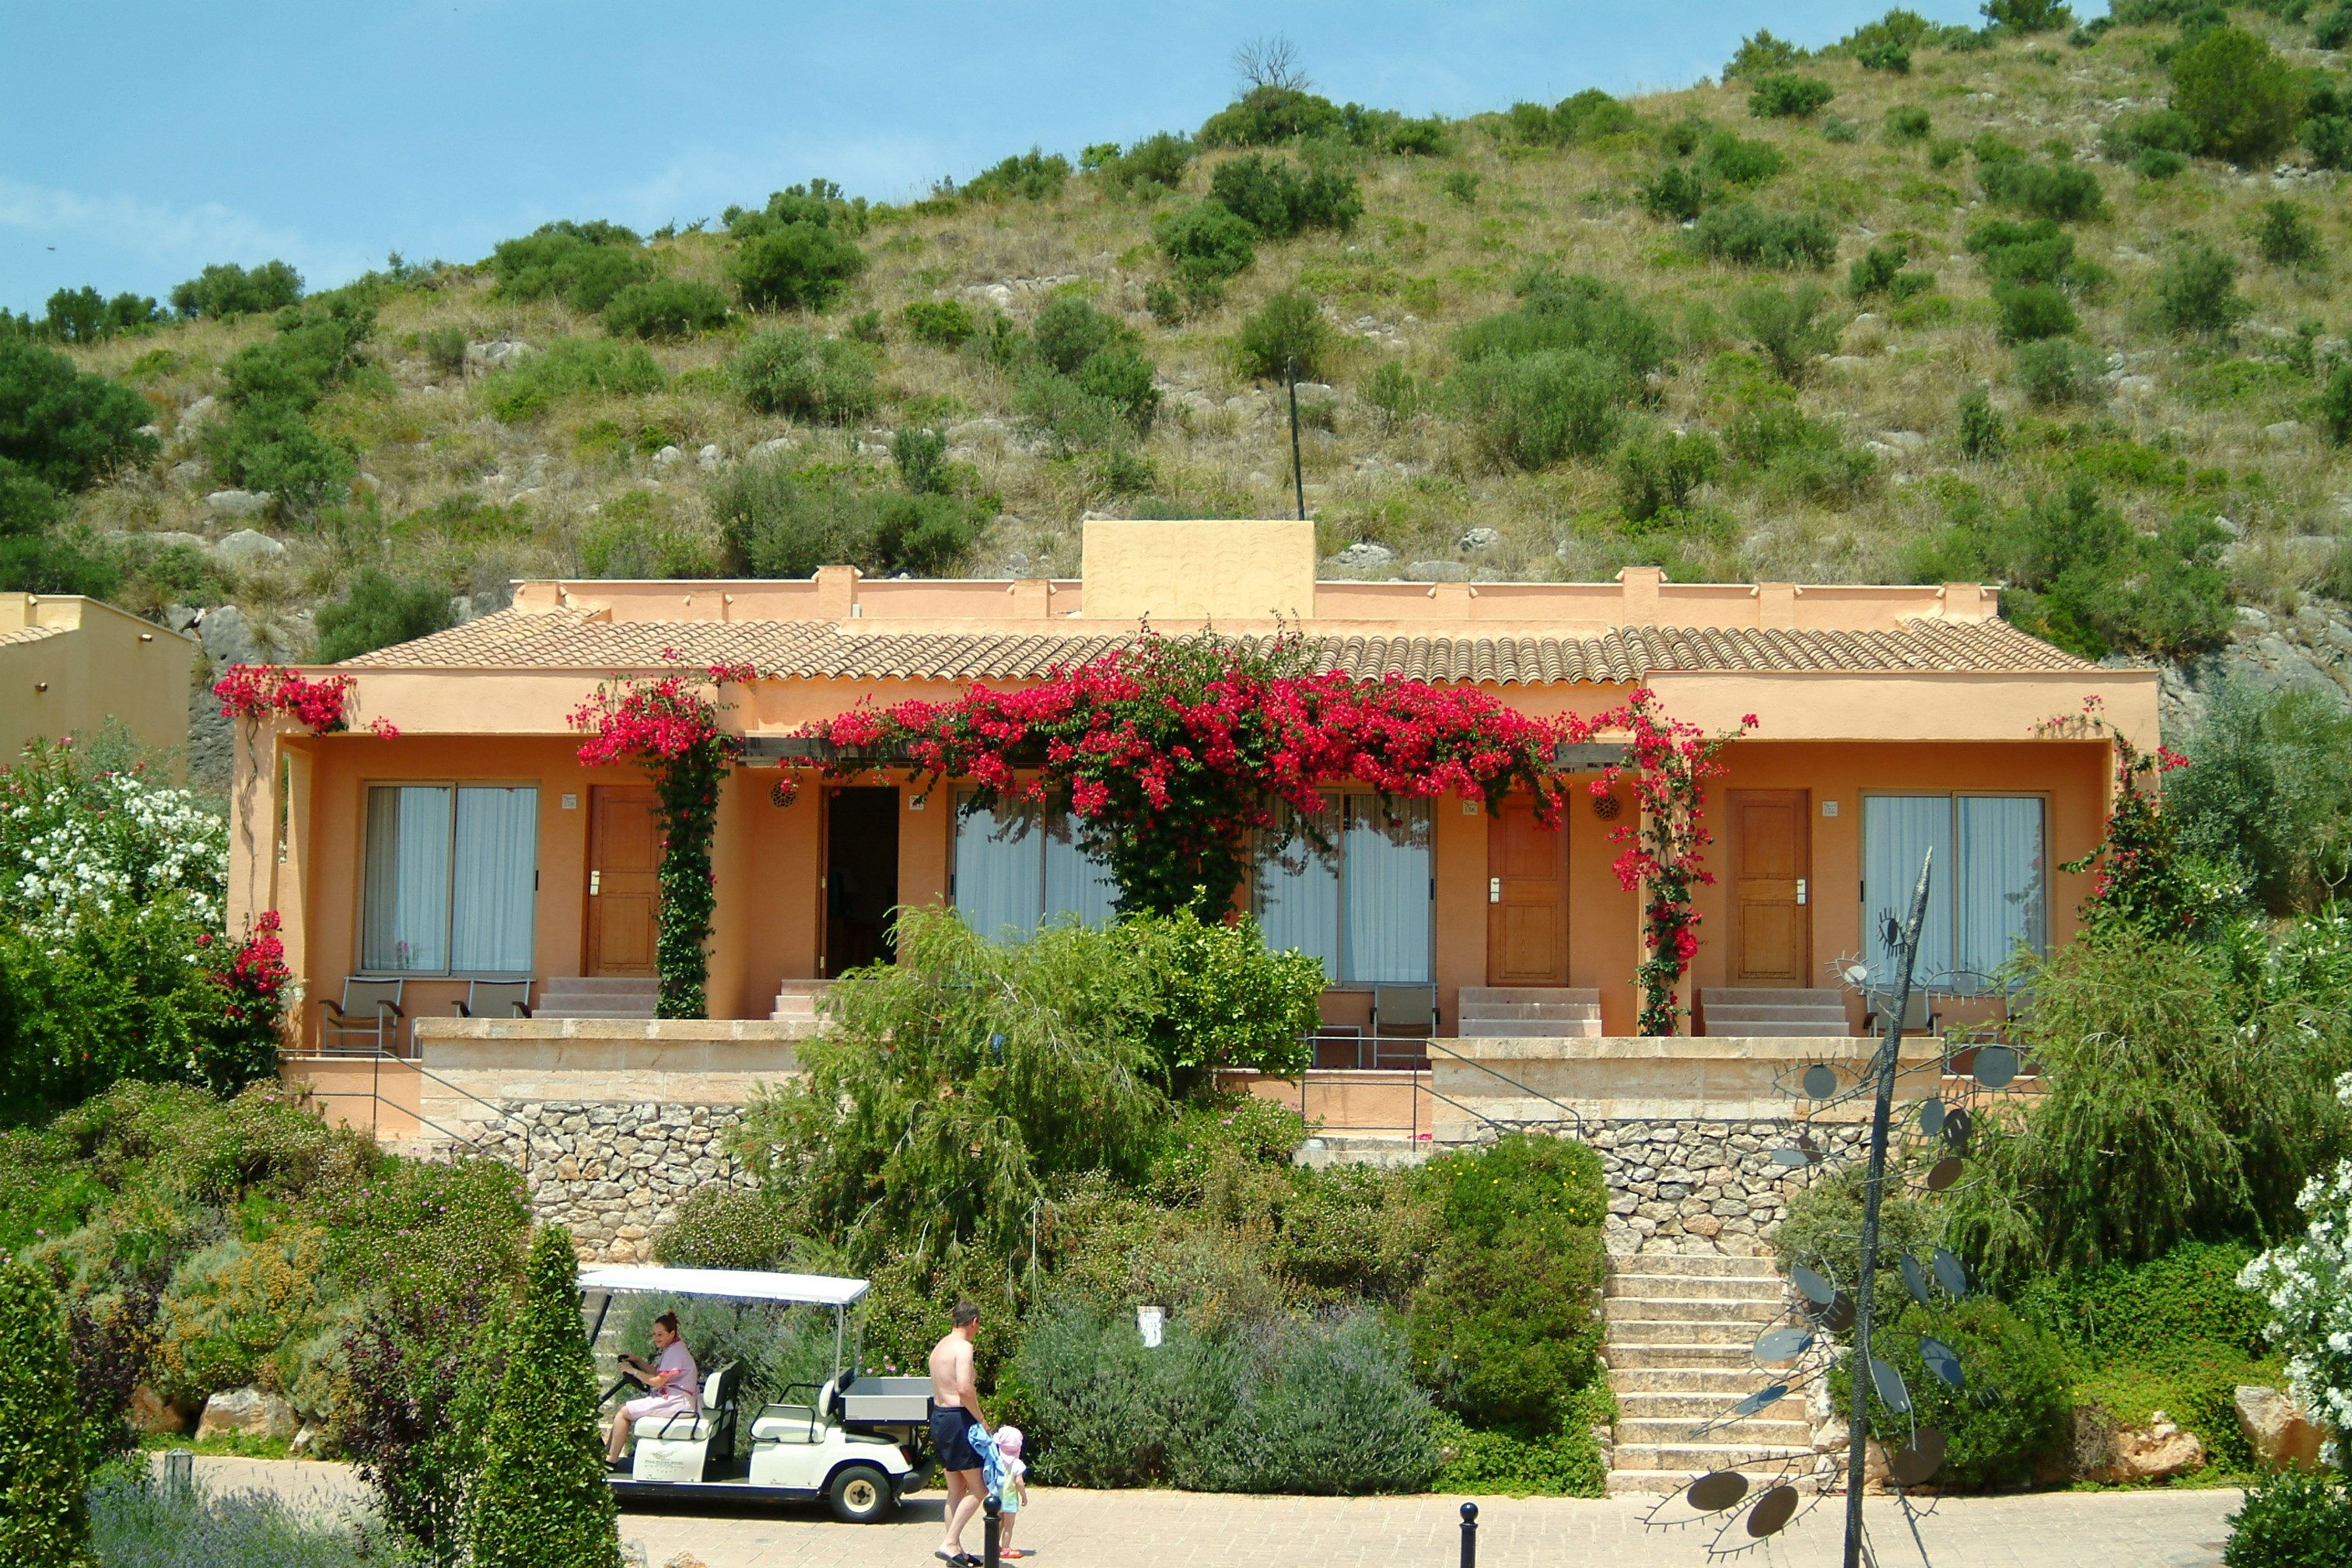 Pula Golf Resort, Son Servera, Mallorca, Signaturresor